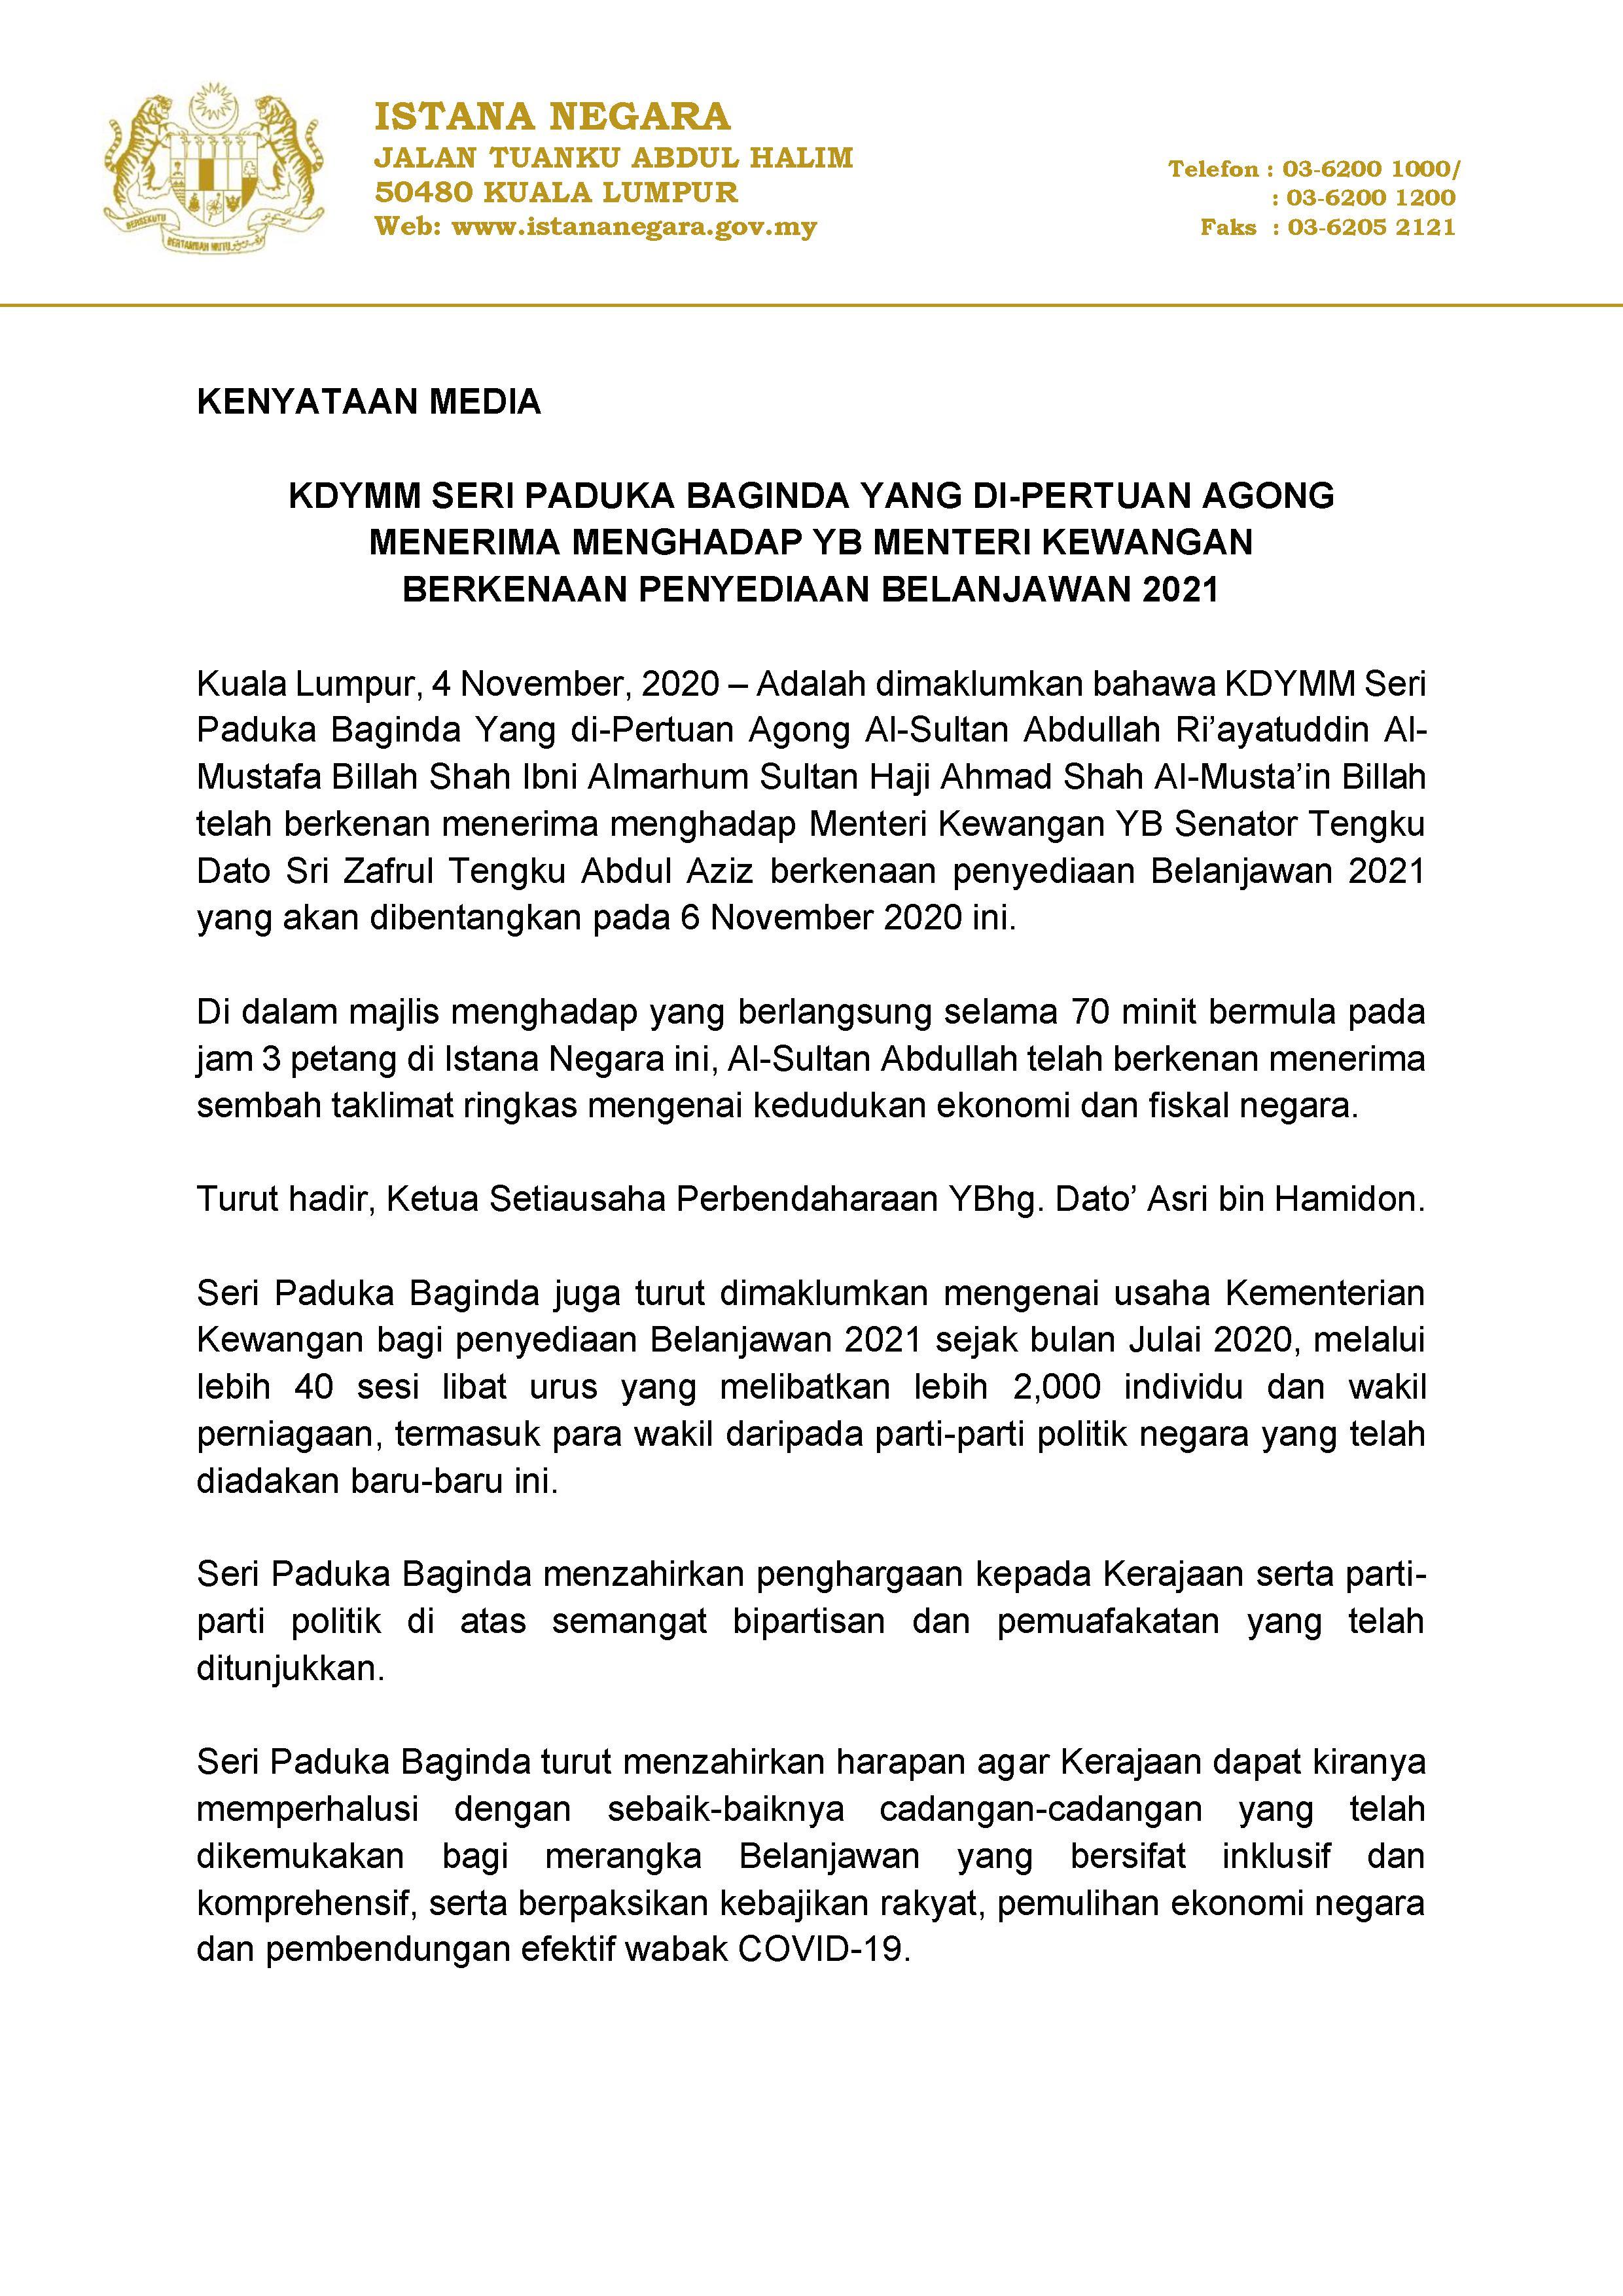 Penyediaan Belanjawan 2021 (1)